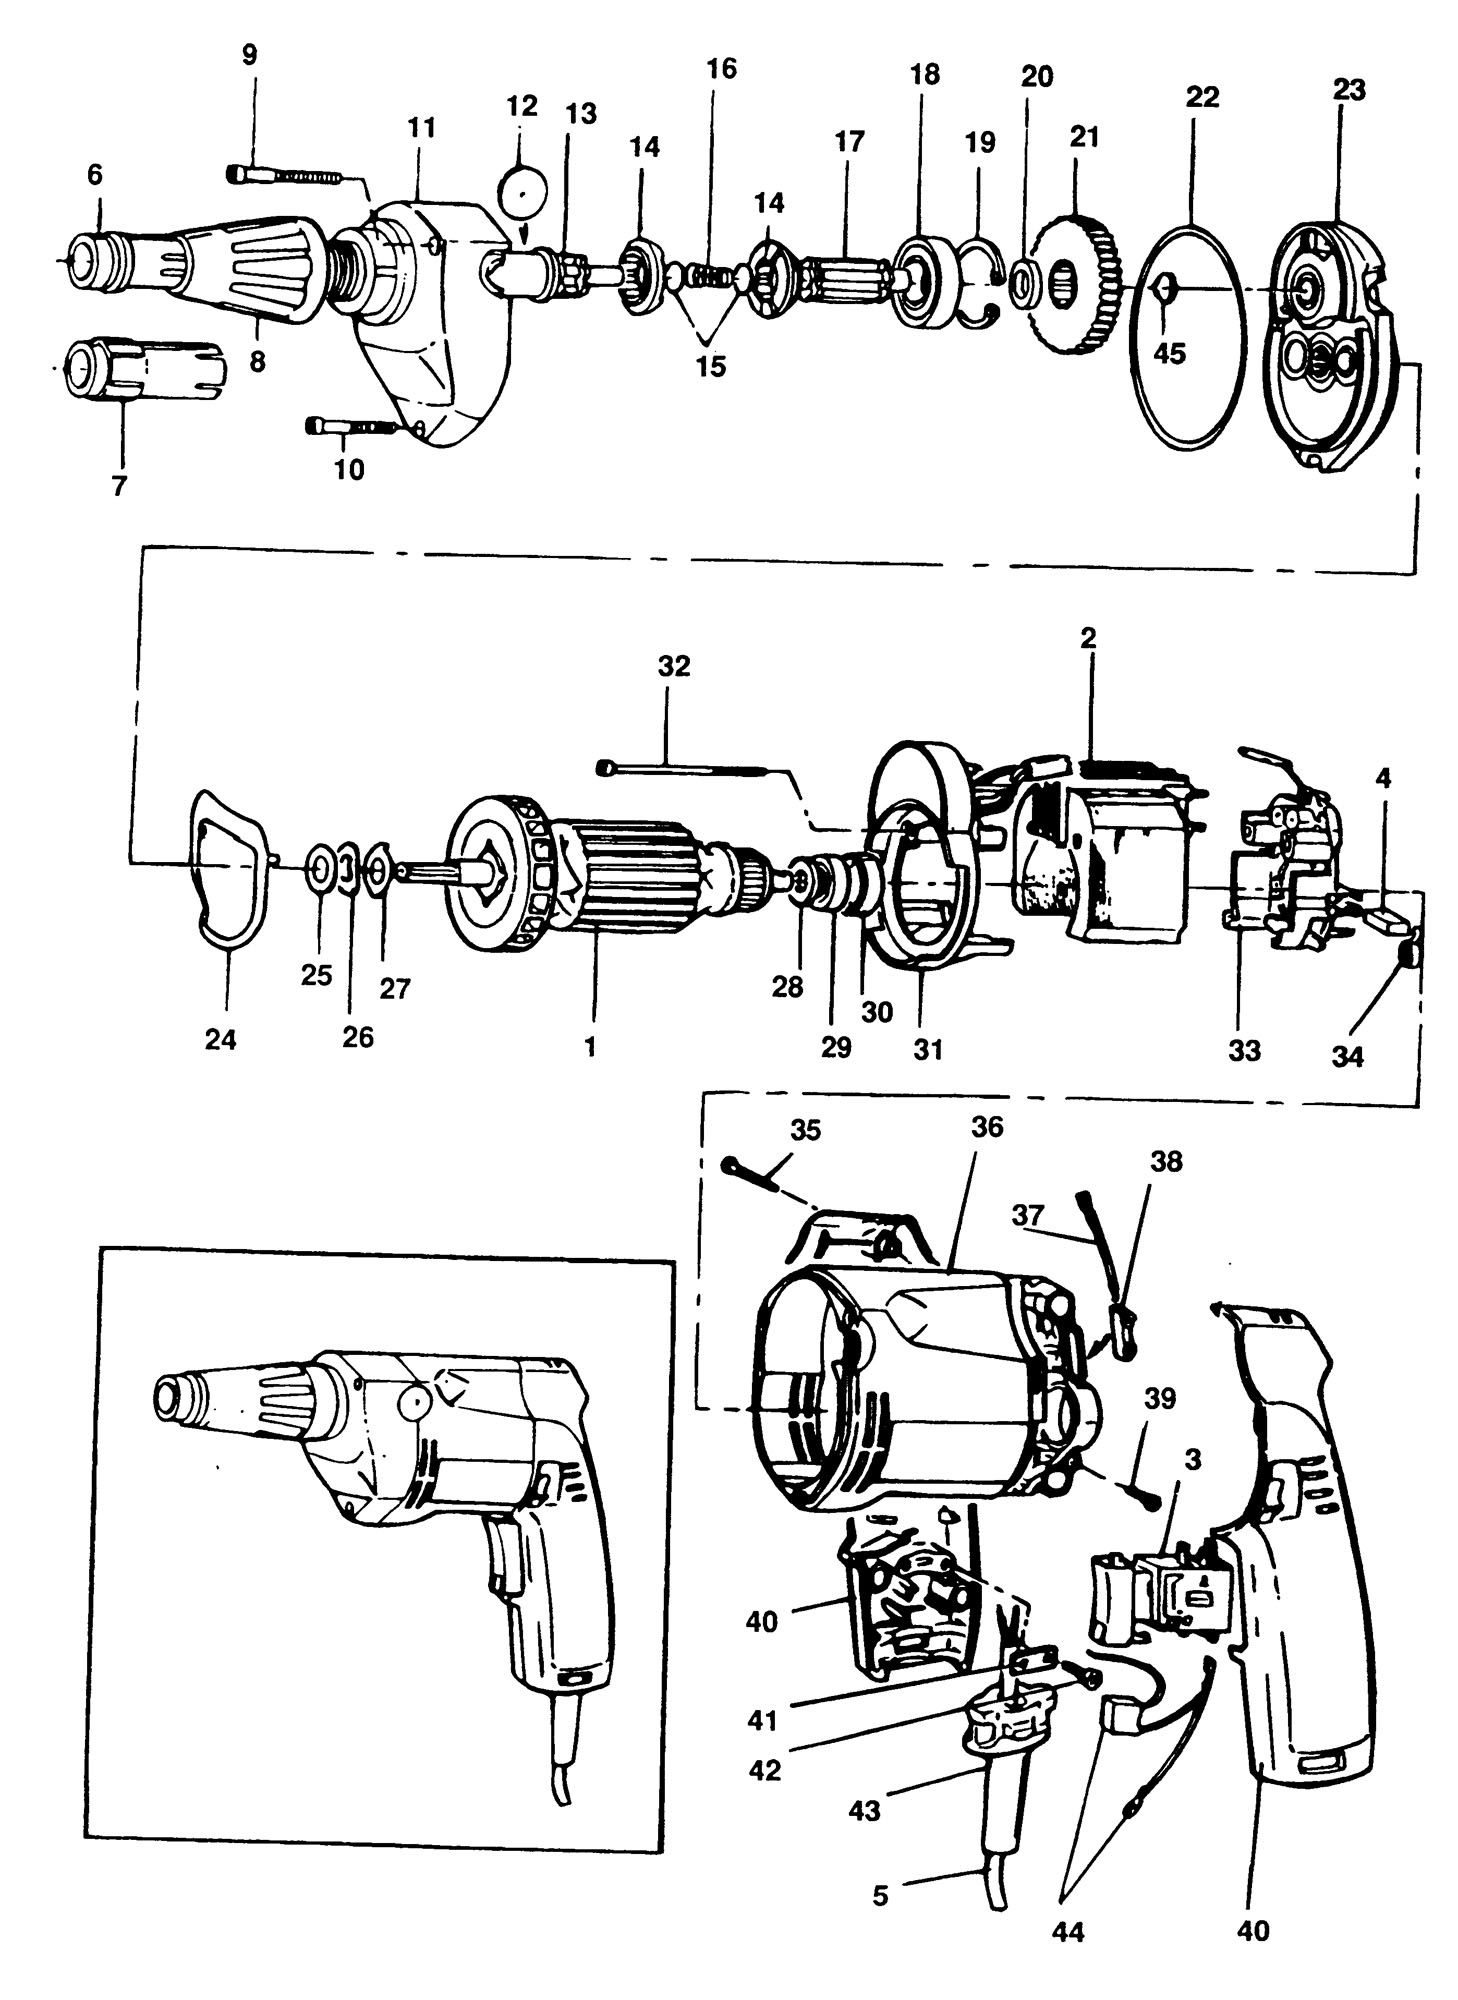 Spares For Elu Esd701 Screwdriver Type 1 Spare Esd701